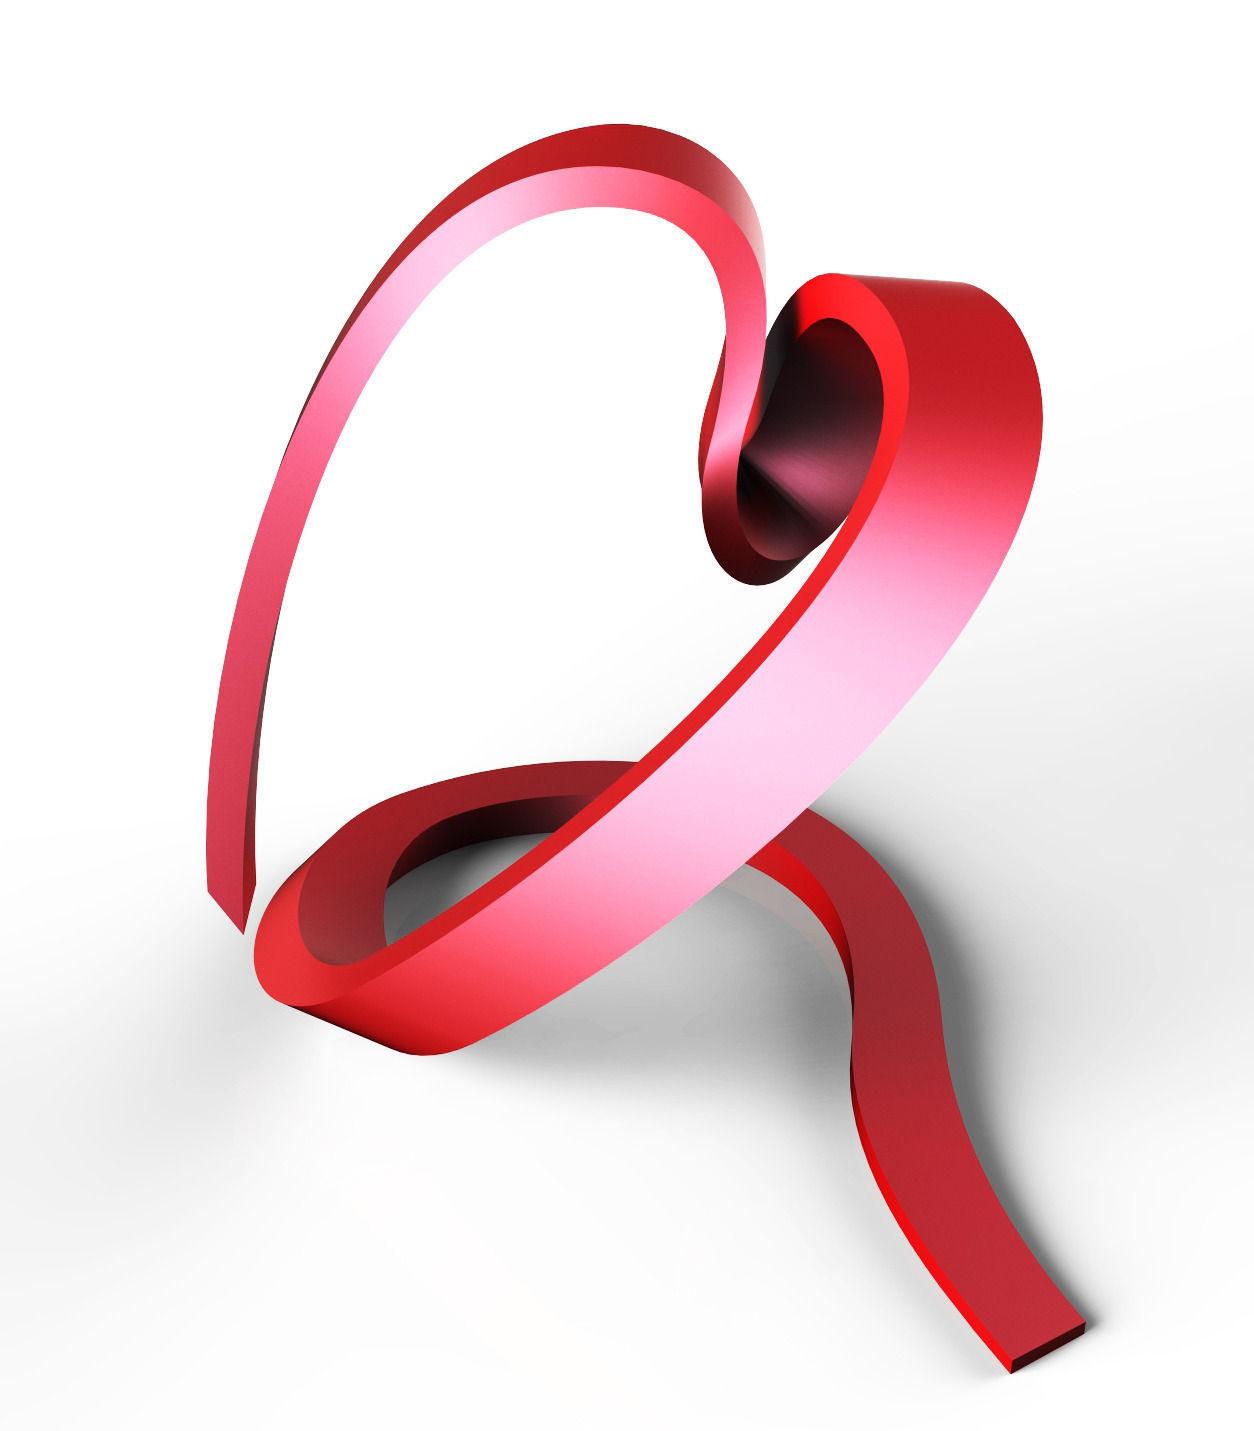 Ribbon Heart 3d Model 3d Printable Stl Cgtrader Com